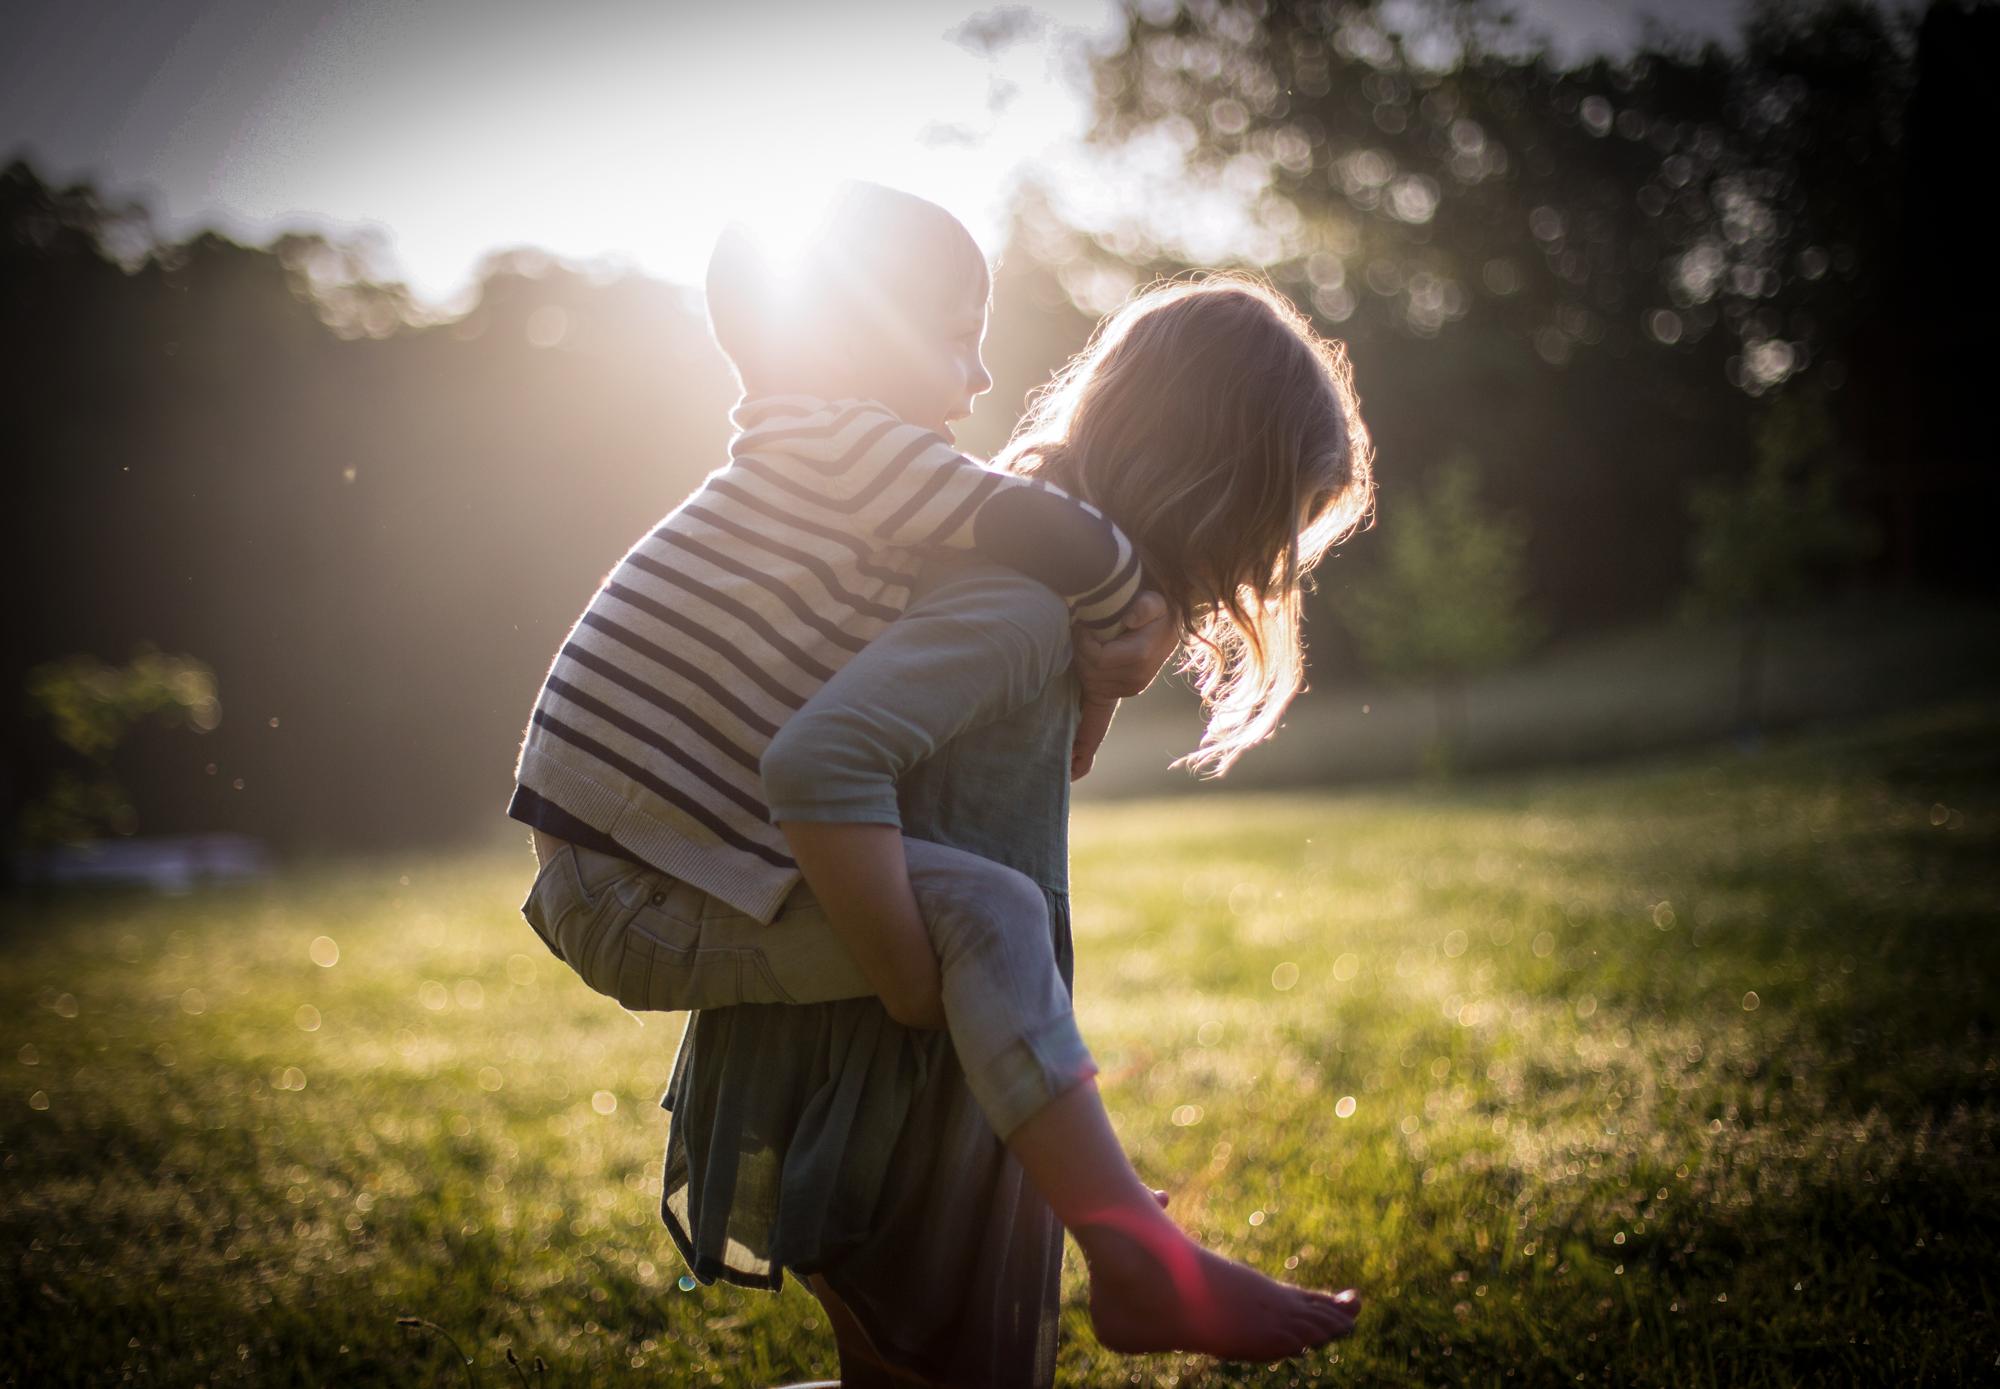 Децата – дар и награда